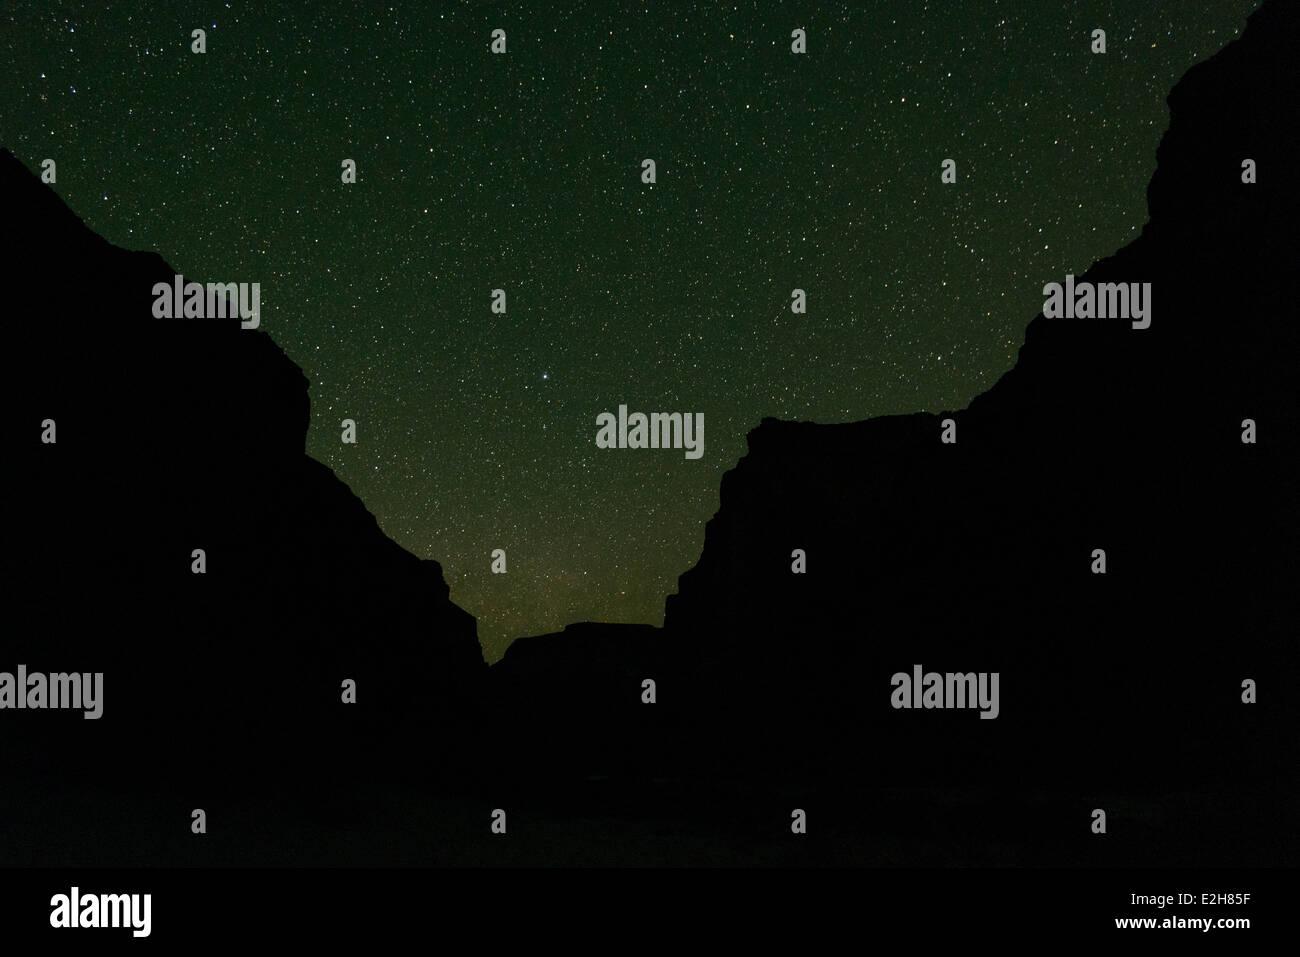 Night sky filled with stars, Grand Canyon, Arizona. - Stock Image